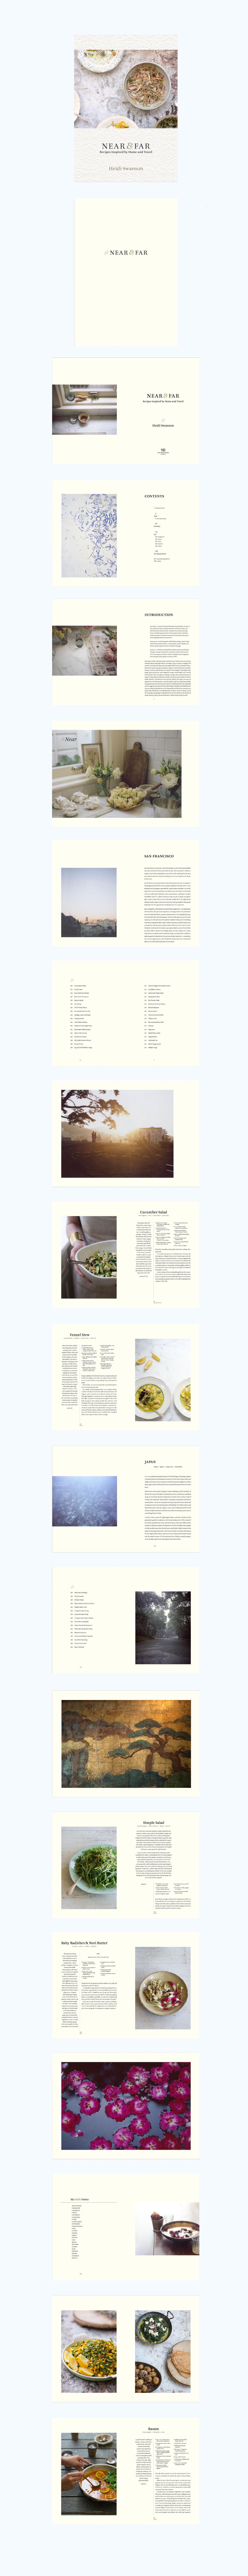 writing a cookbook proposal 101 cookbooks